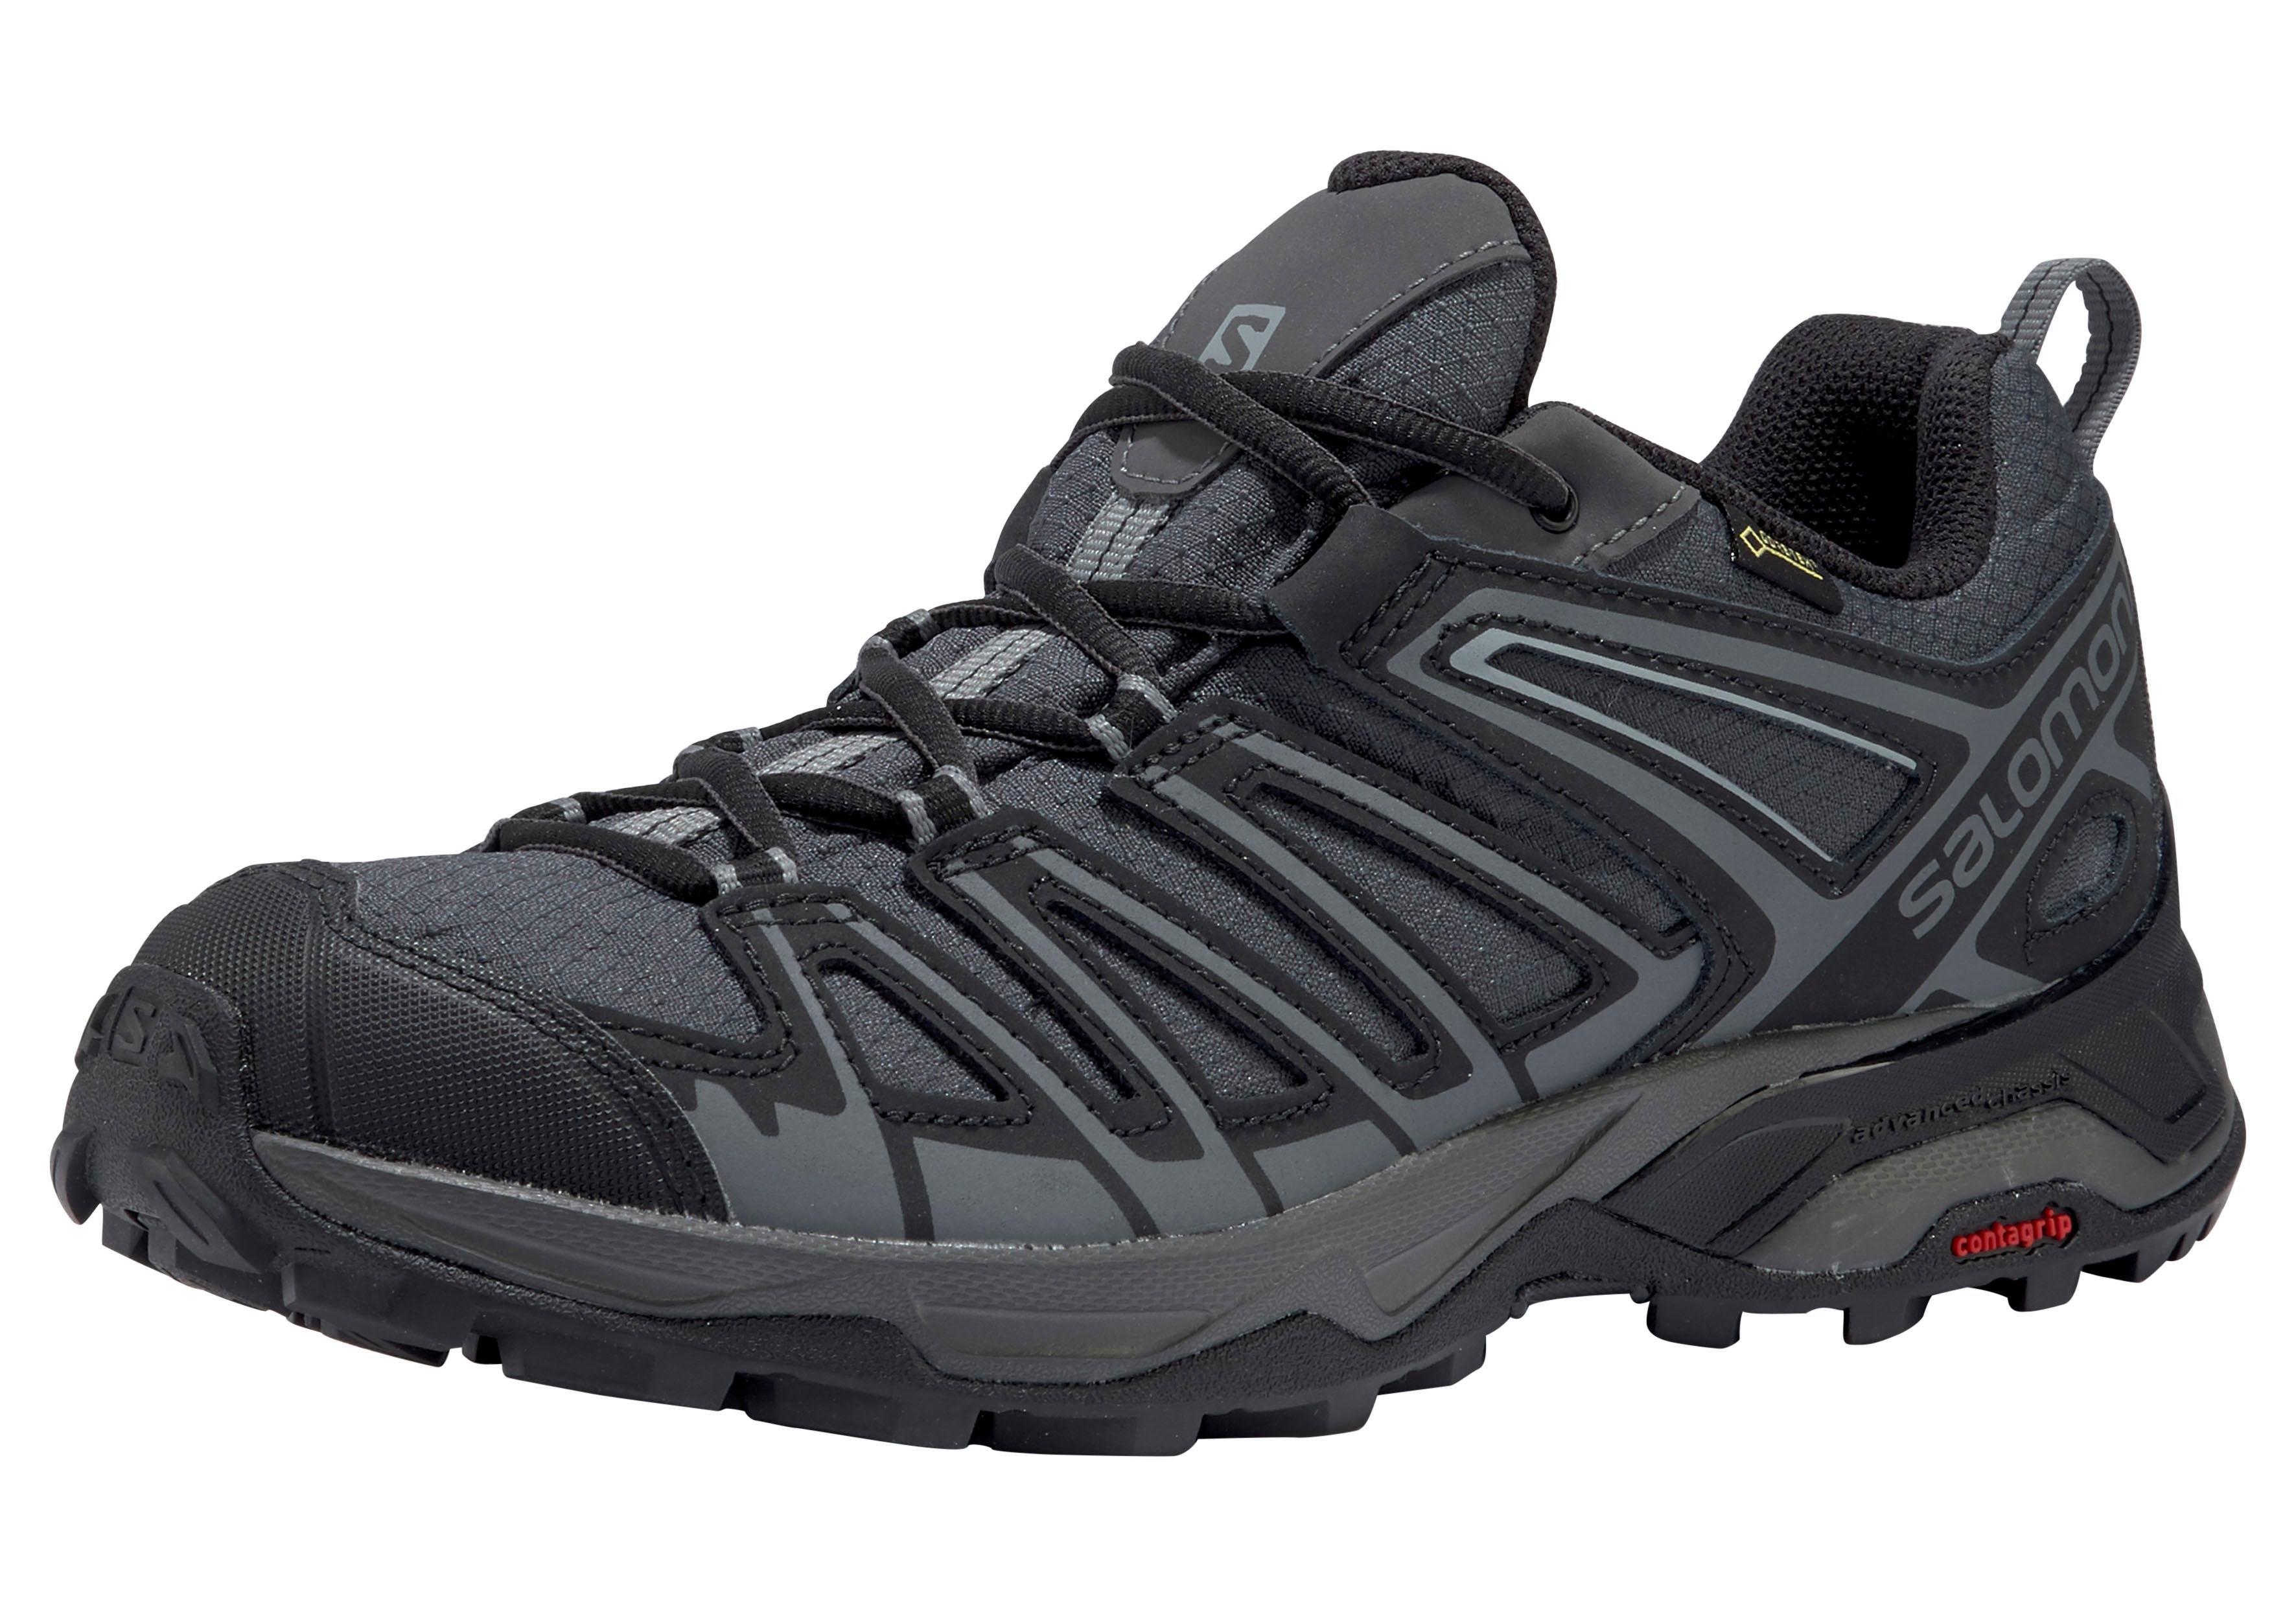 Salomon outdoorschoenen »X ULTRA 3 PRIME GTX®« nu online bestellen